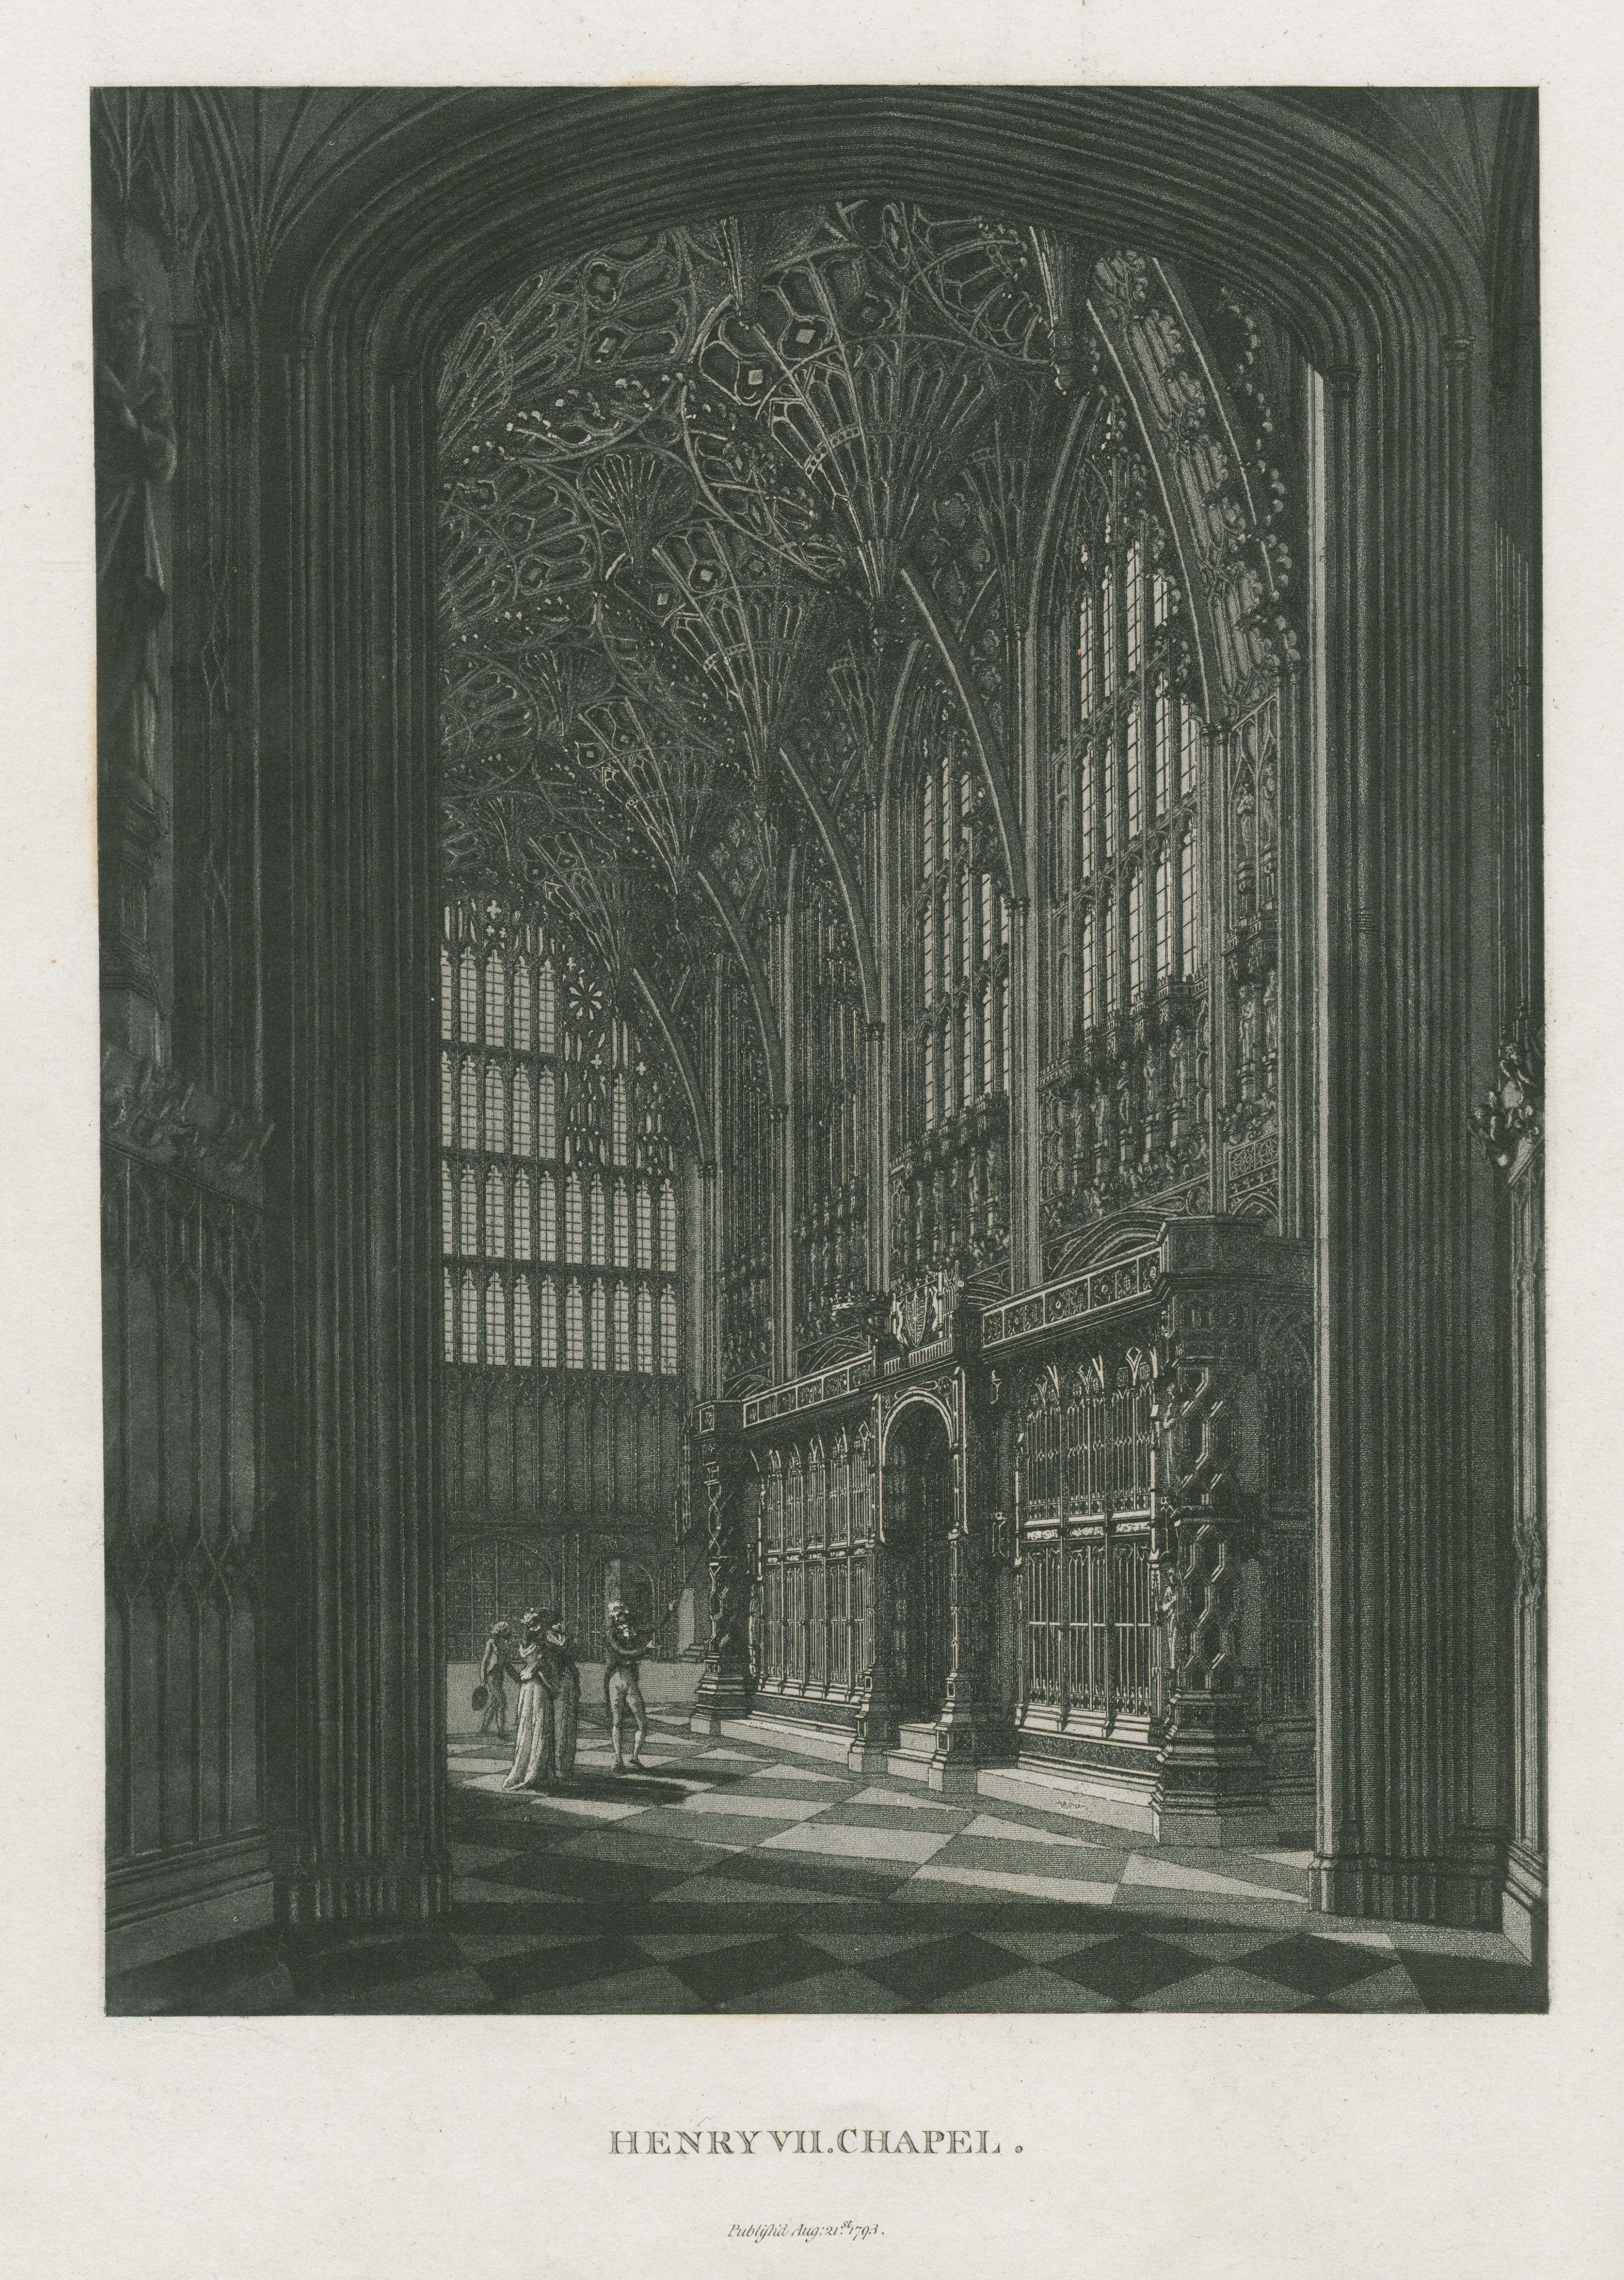 011 - Malton - Henry VII Chapel